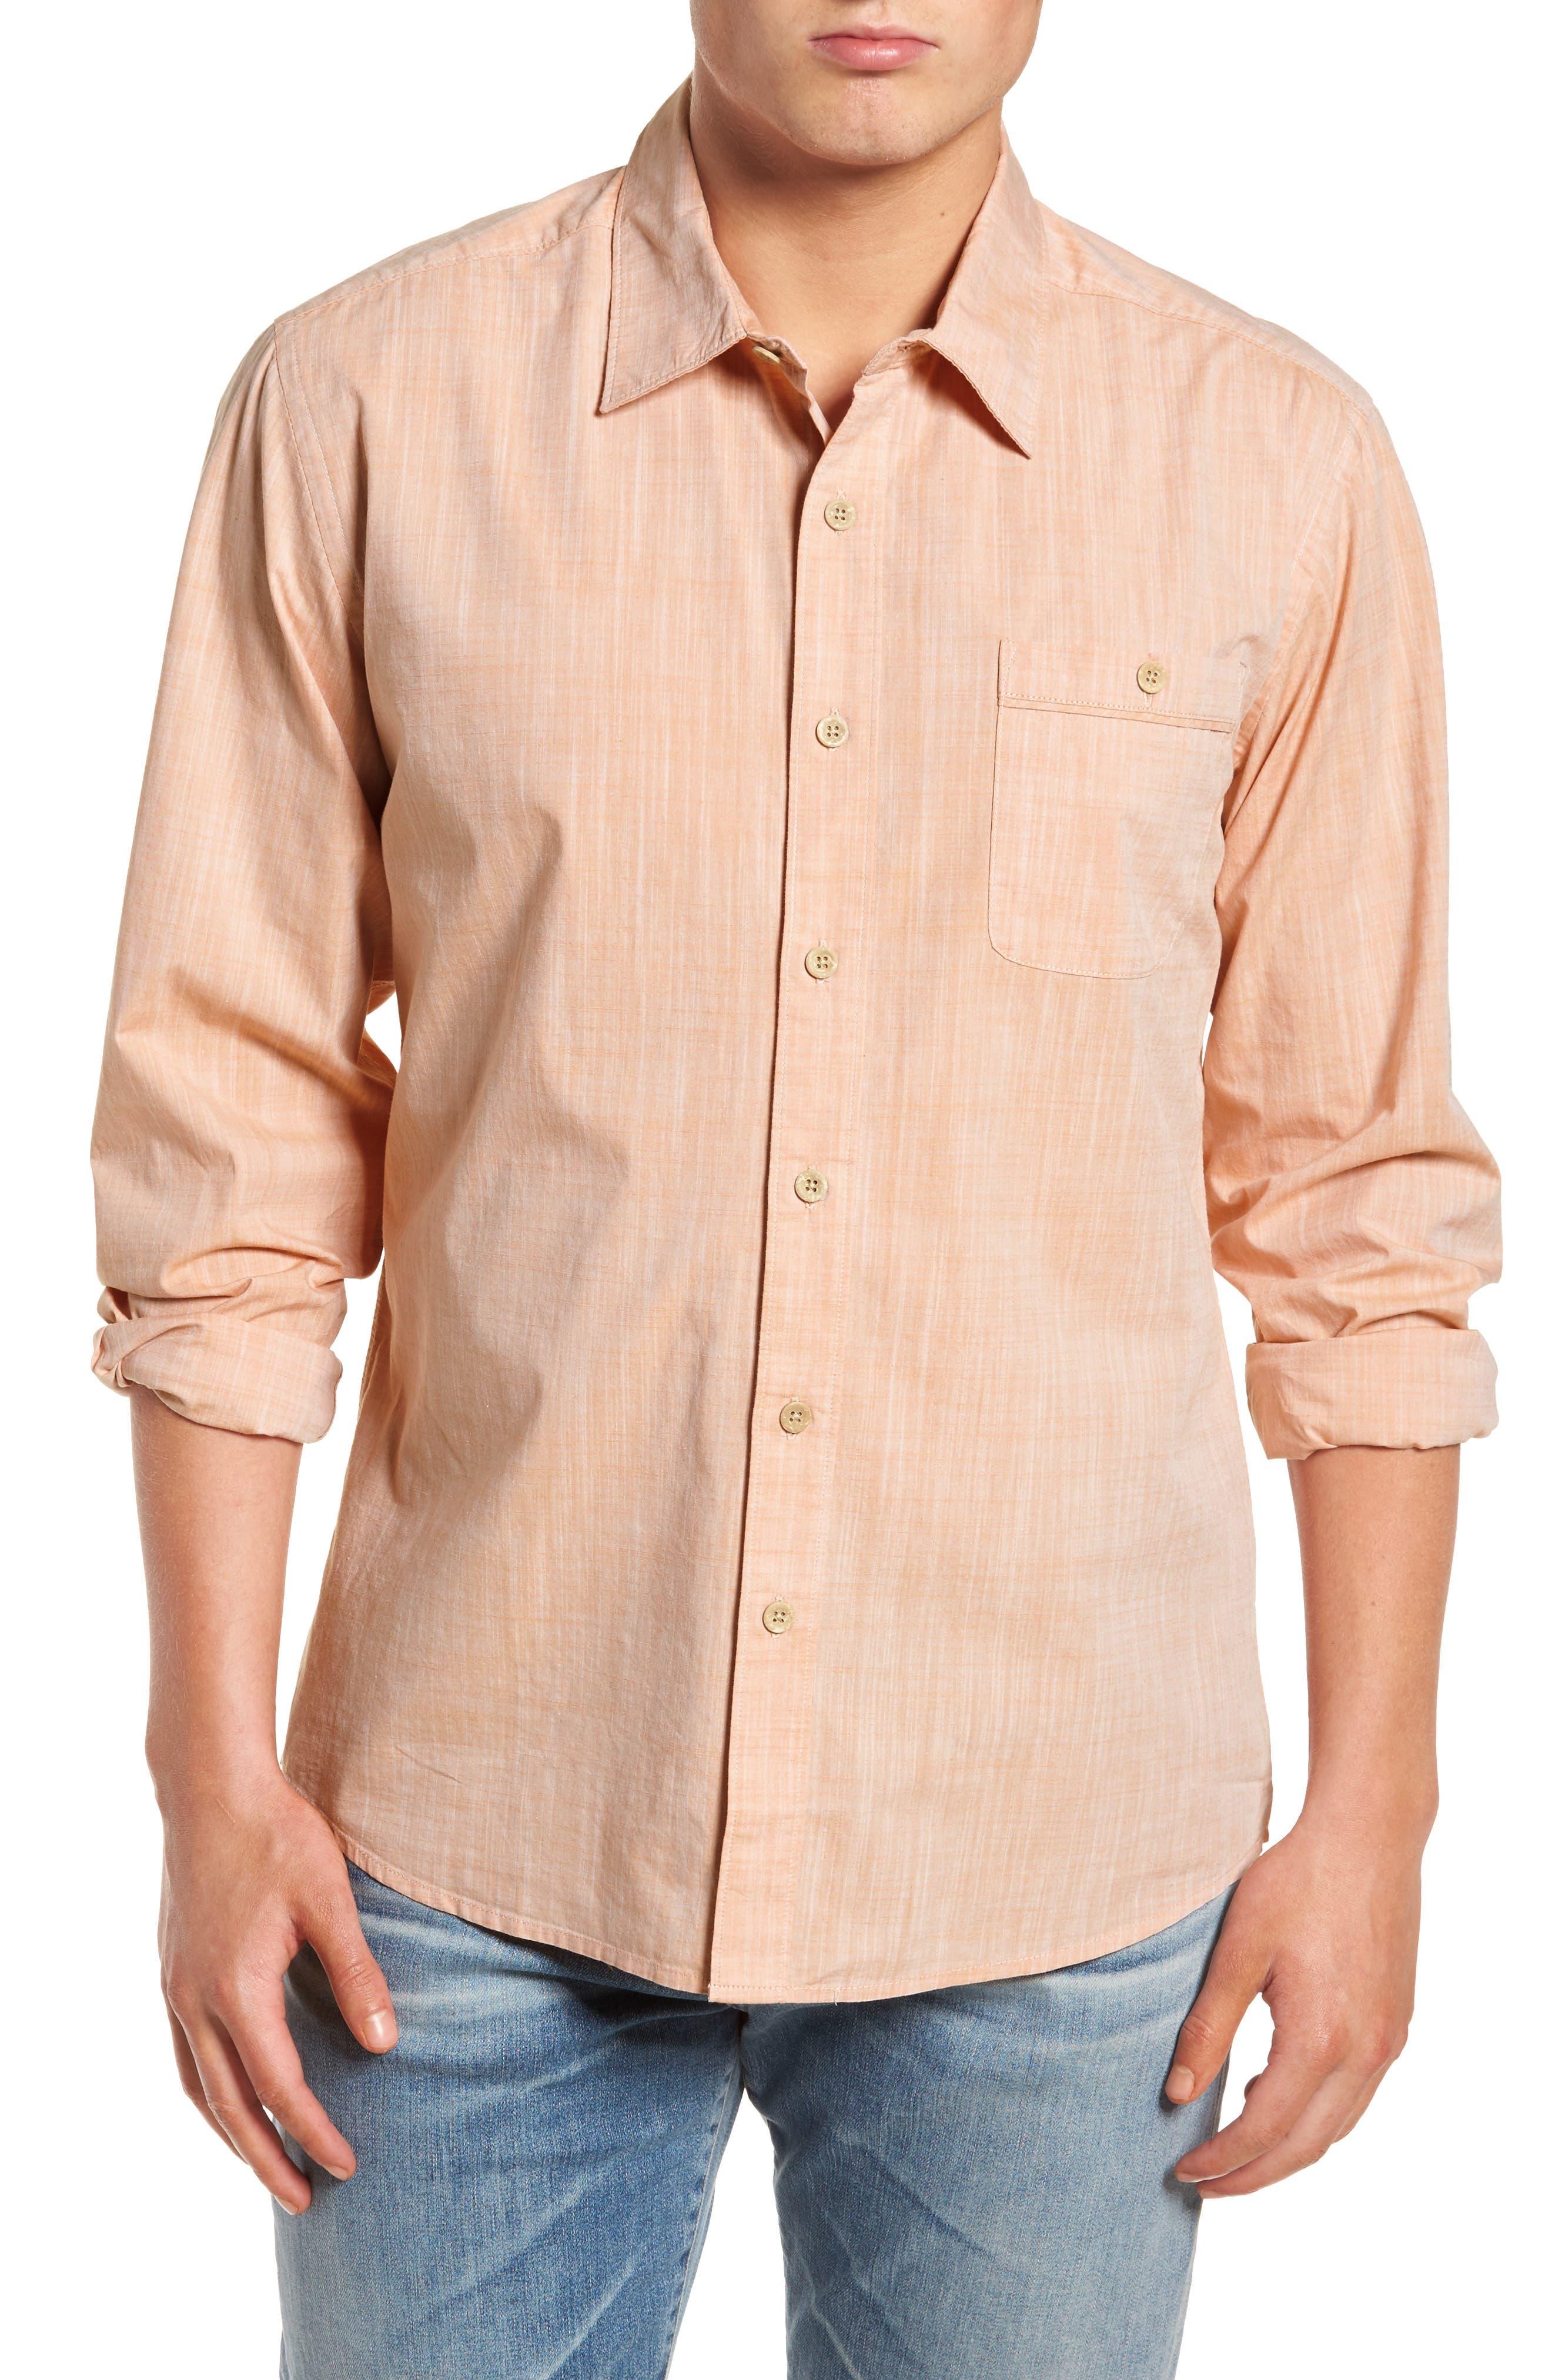 Mai Tai Regular Fit Sport Shirt,                         Main,                         color,